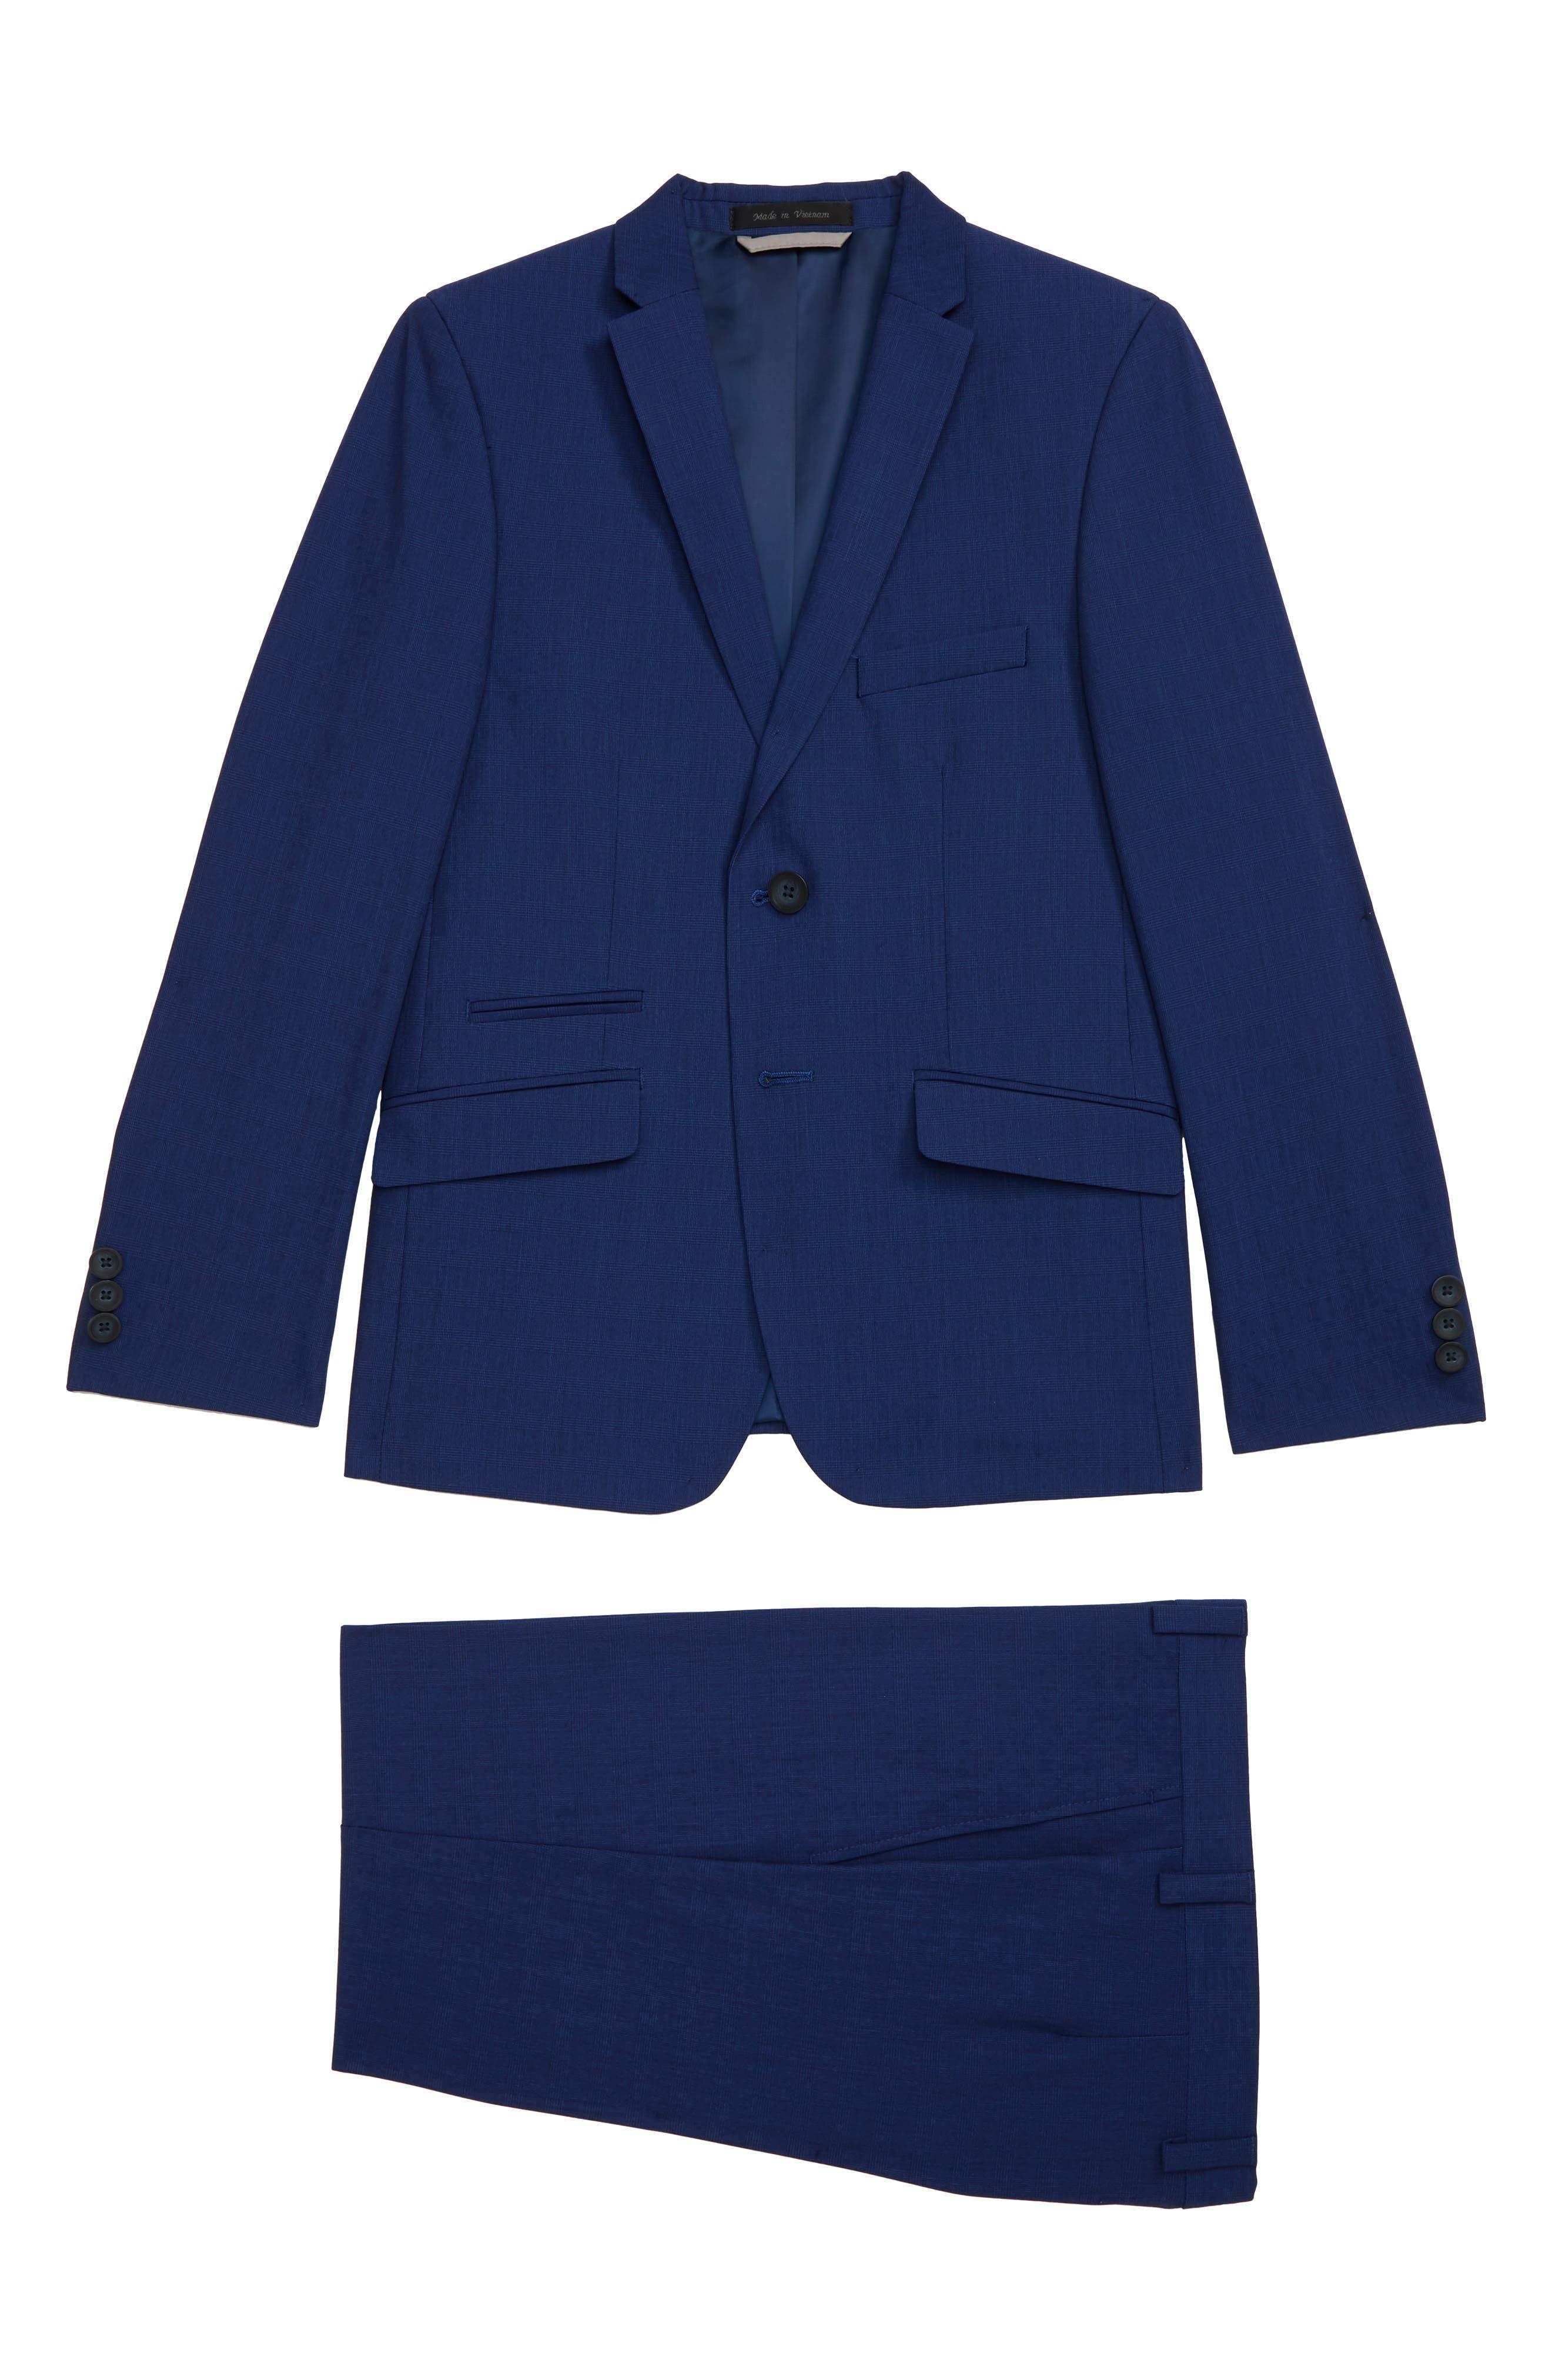 12 Boys Spring Summer Gray Plaid Suit Set Jacket and Pants 2 Pieces Set 4T